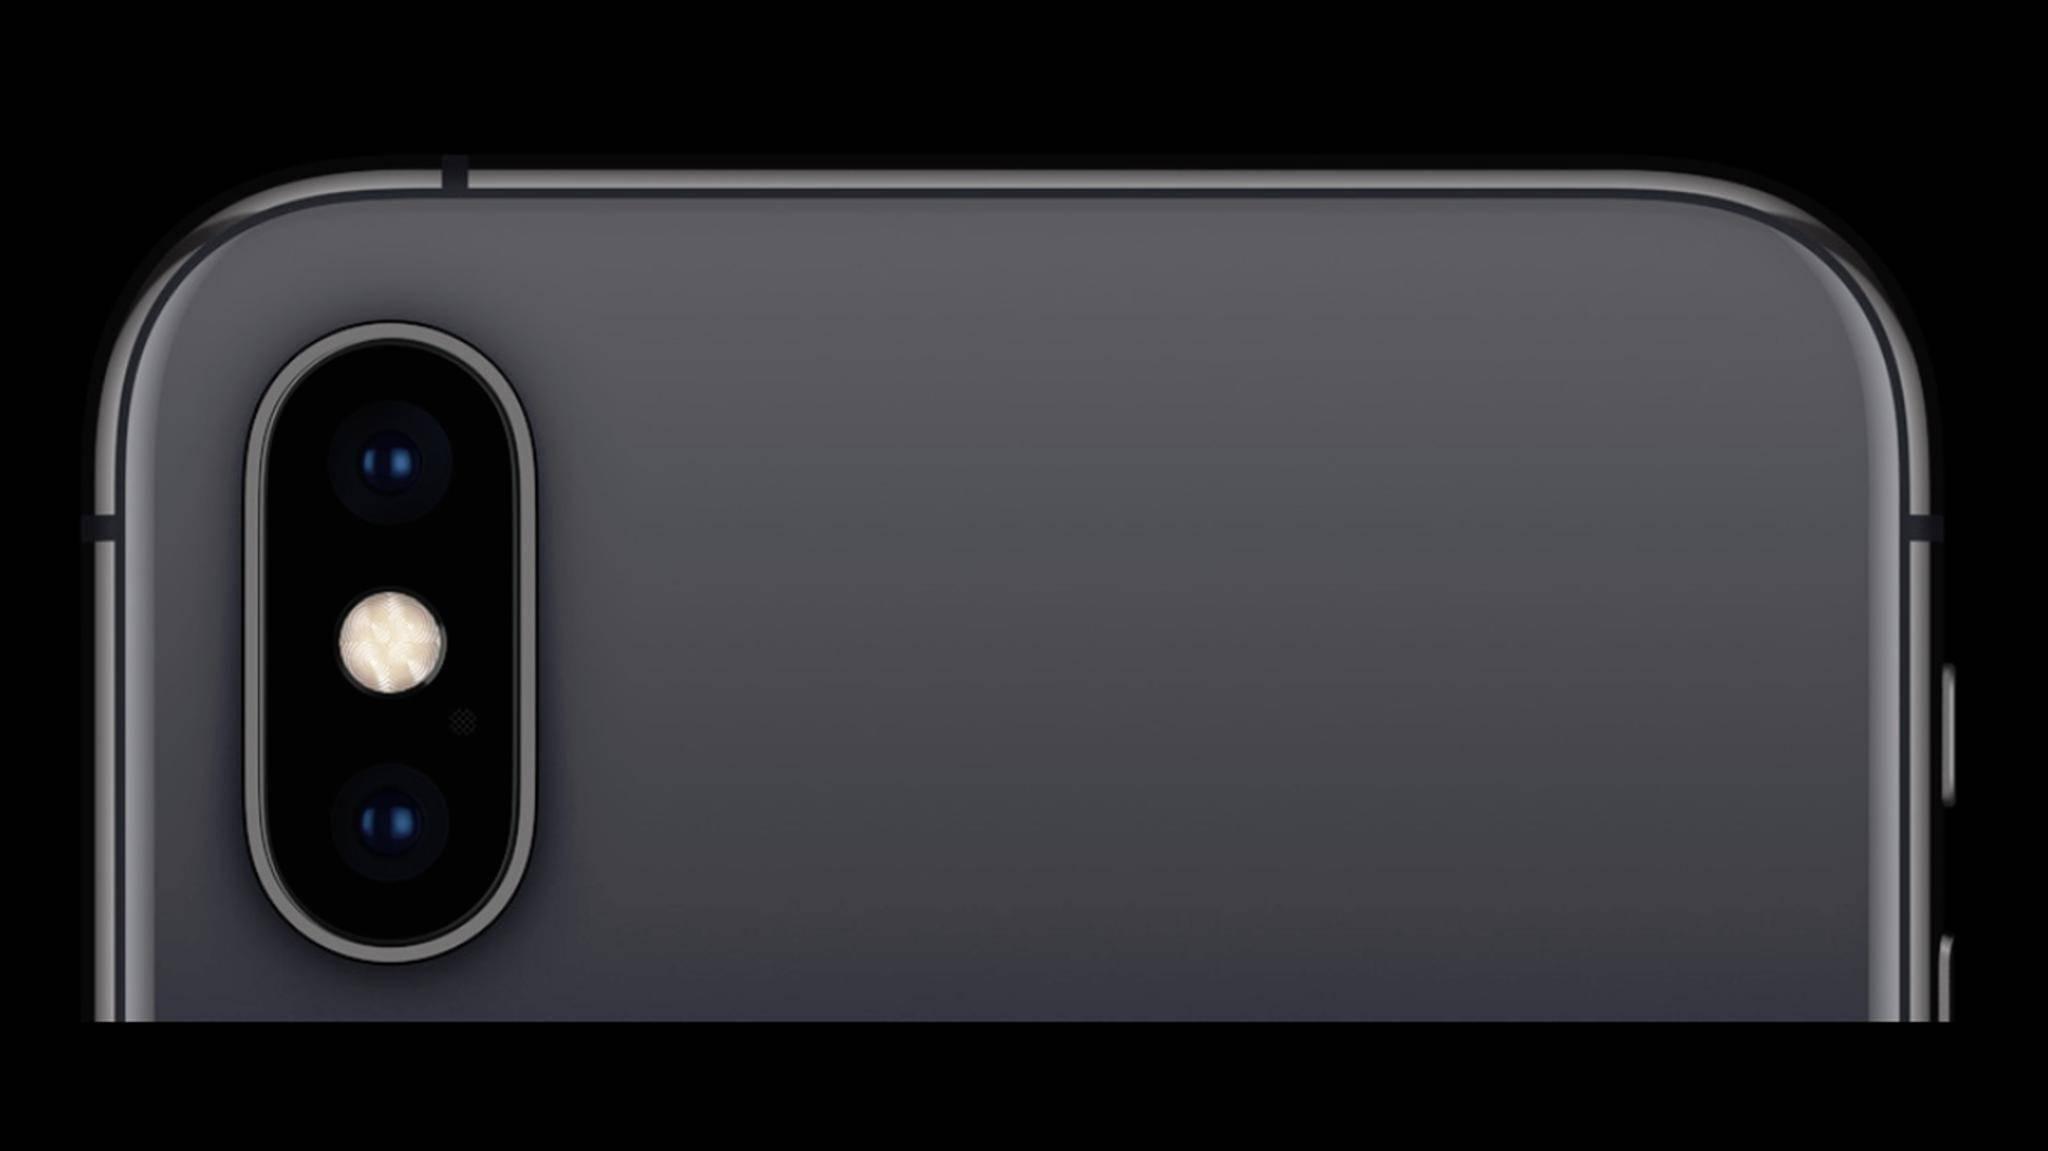 iphone xs max alle infos zu preis release und features. Black Bedroom Furniture Sets. Home Design Ideas